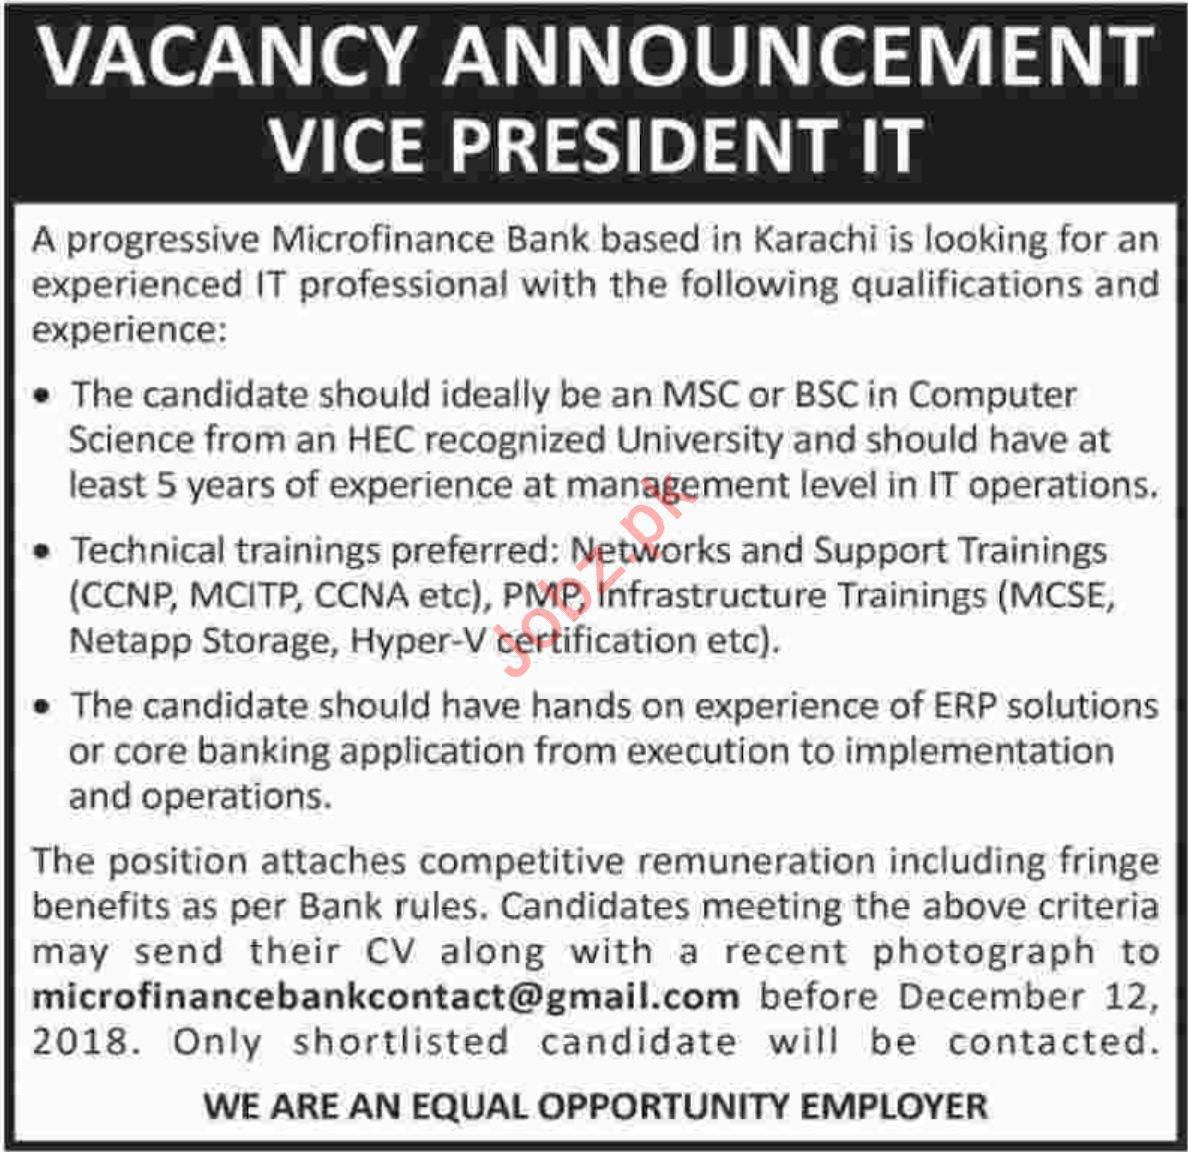 Vice President IT Jobs at Microfinance Bank